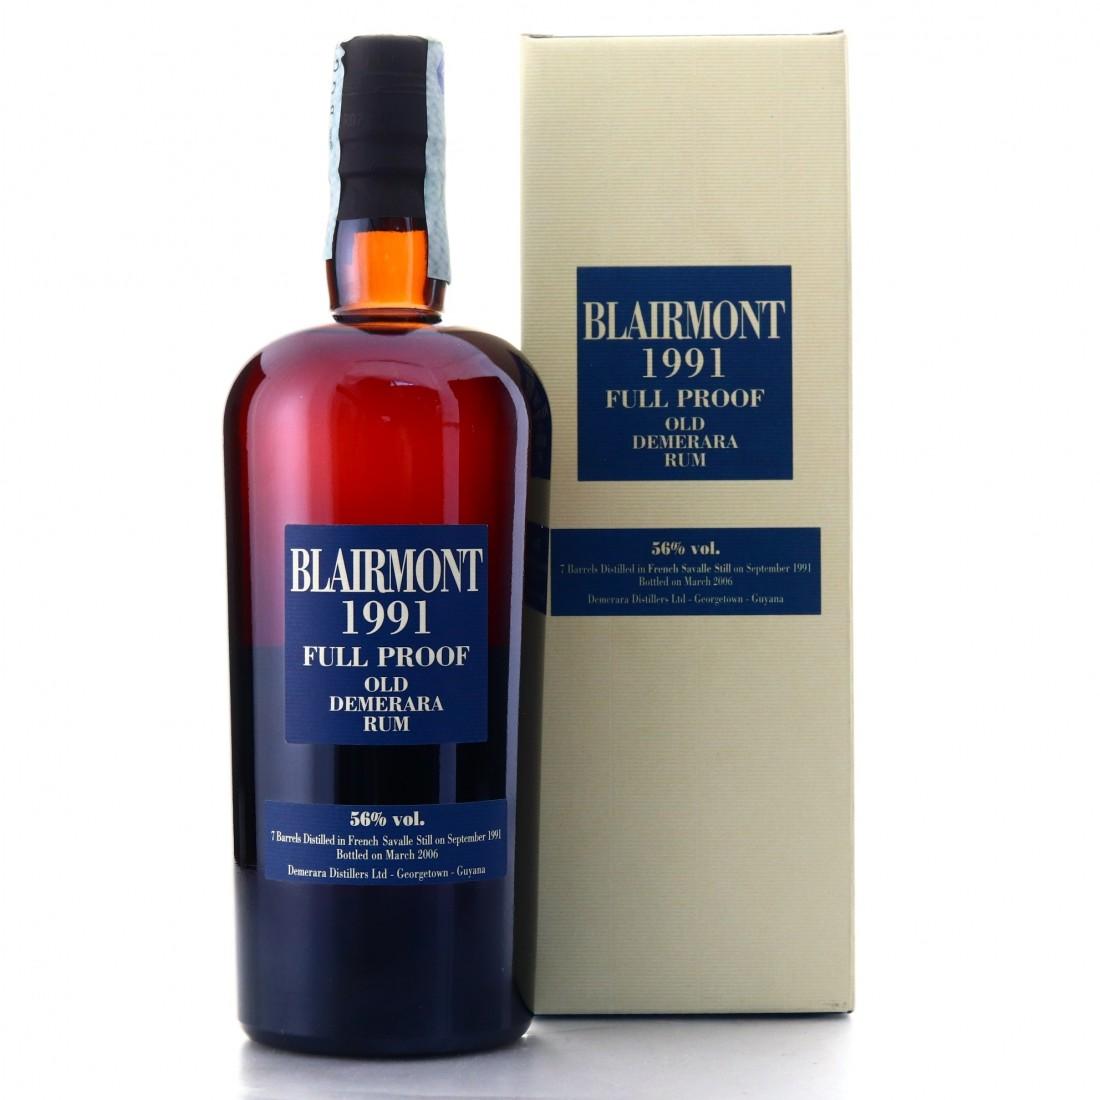 Blairmont < B > 1991 Velier 15 Year Old